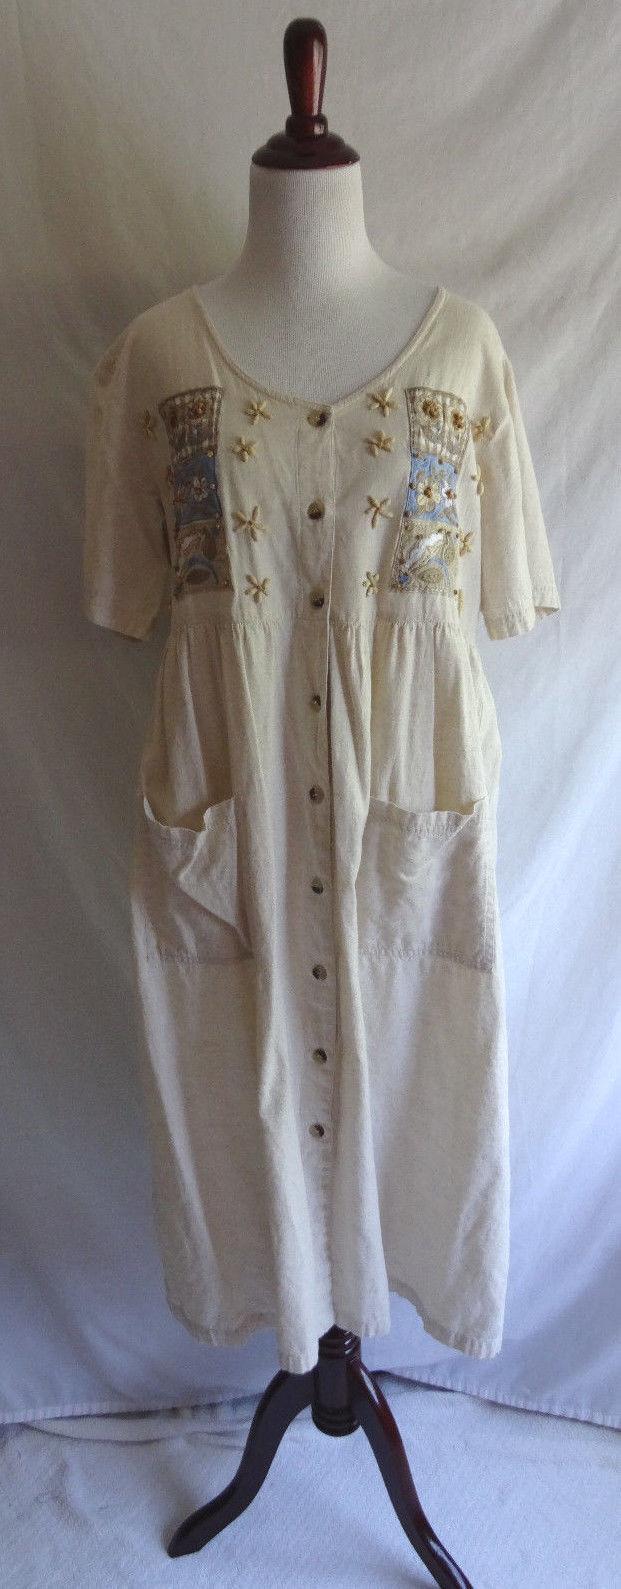 Go Softly Patio MED Ivory Cotton Flax Beaded Embroiderot Muu Lounge House Dress